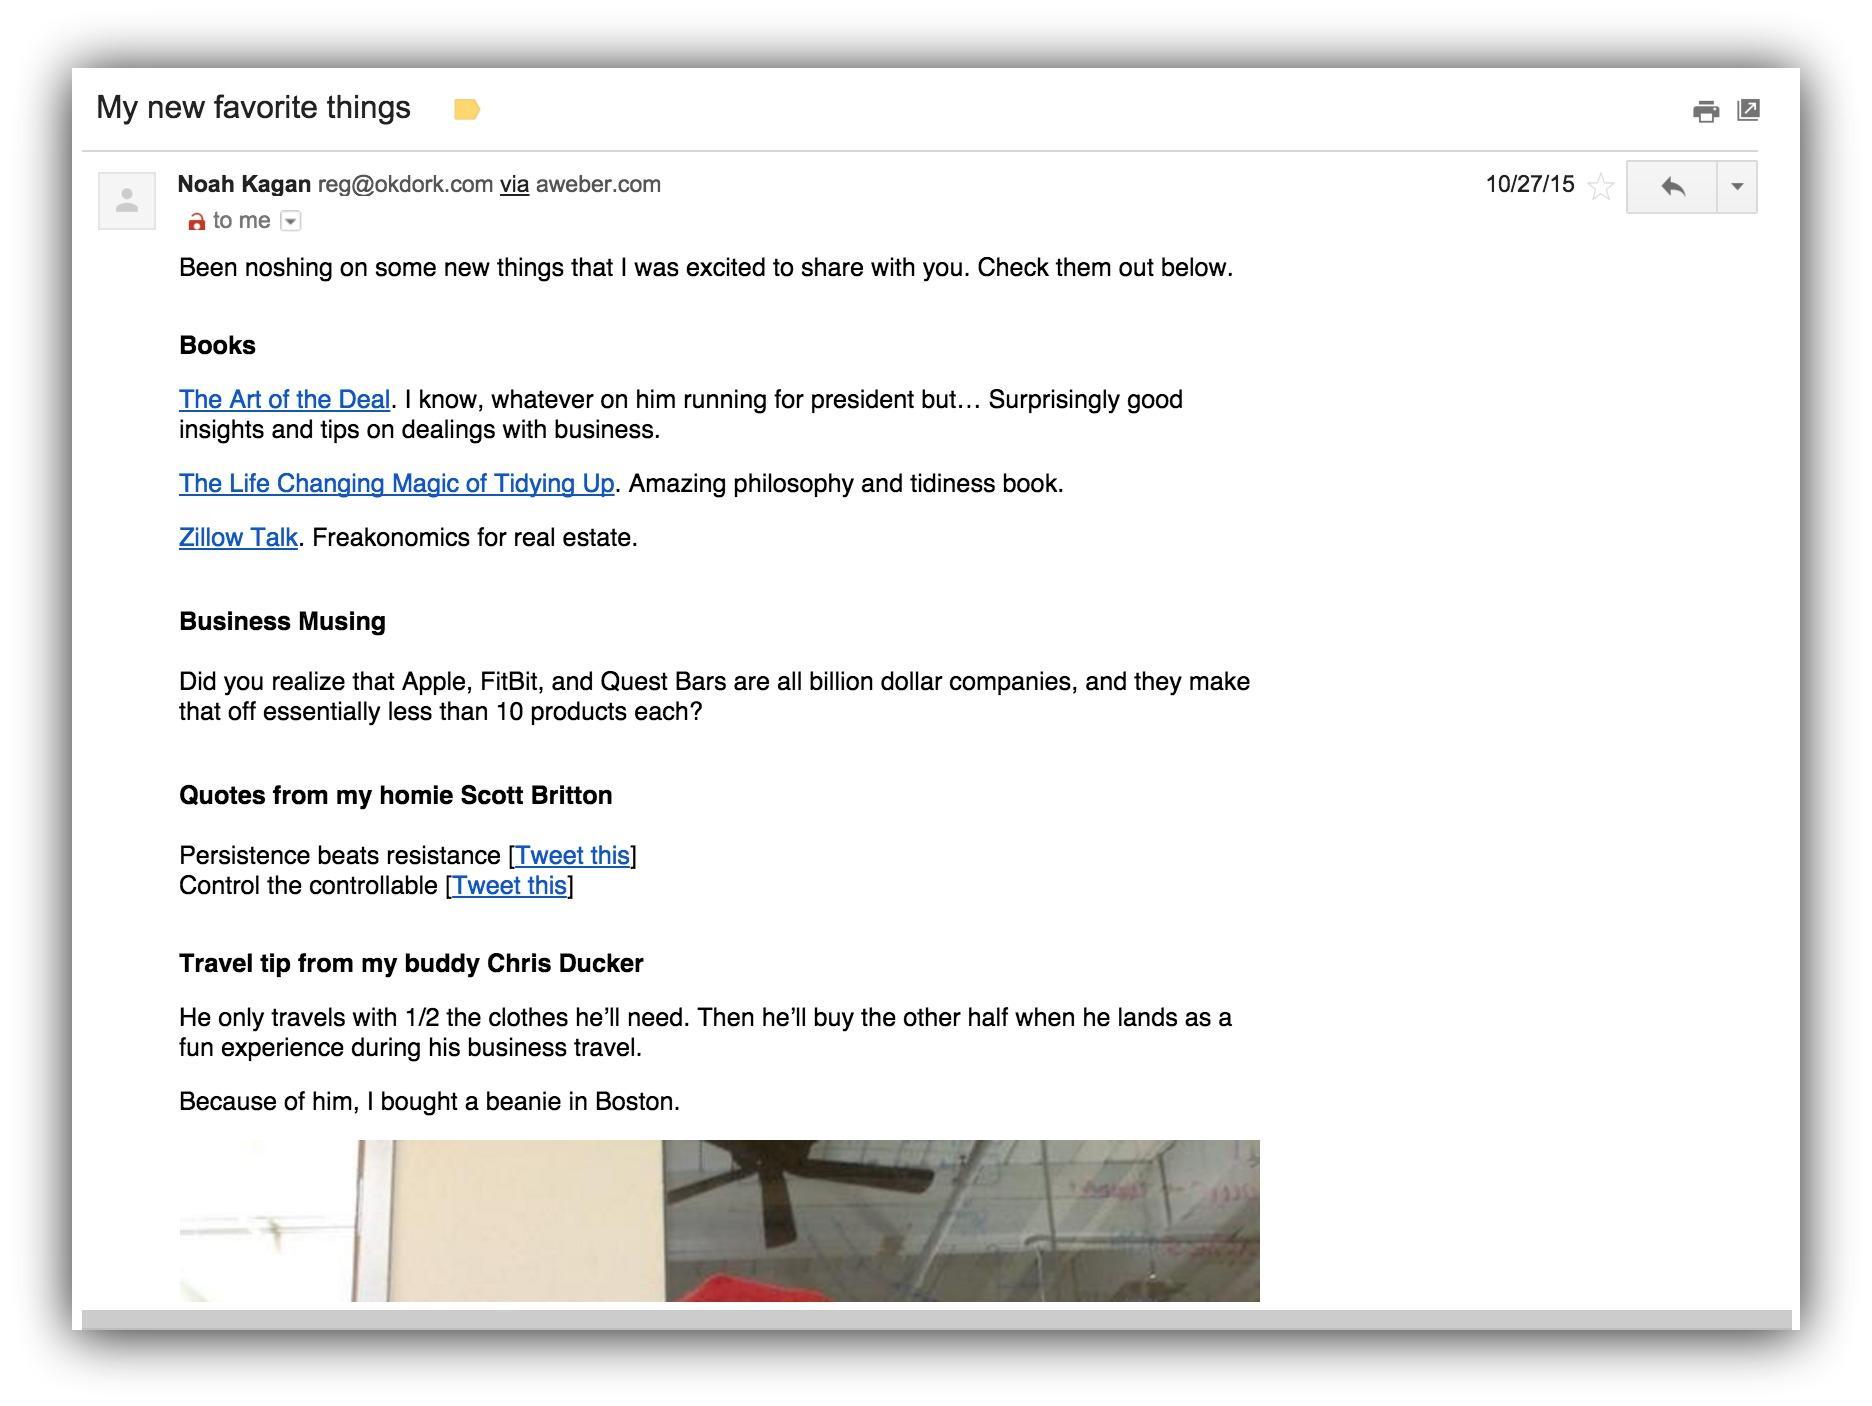 Screenshot of an email sent by Noah Kagan